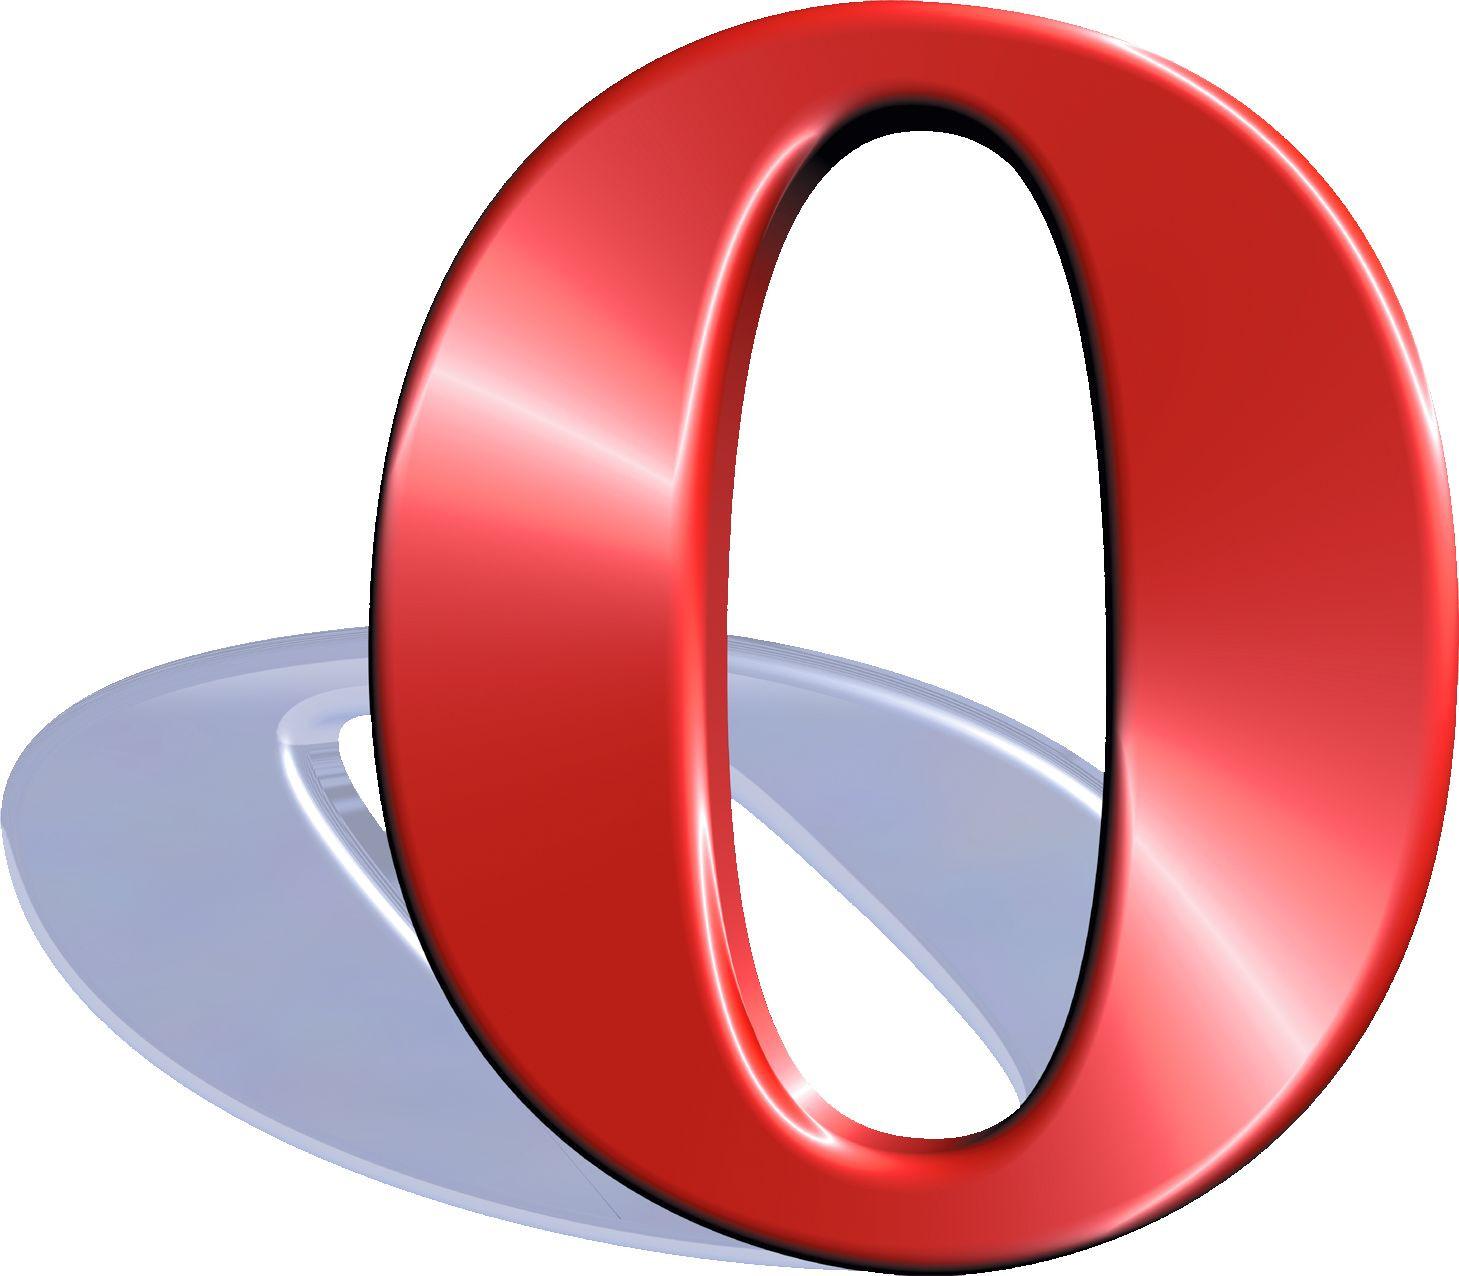 opera 2012 clubic gratuit